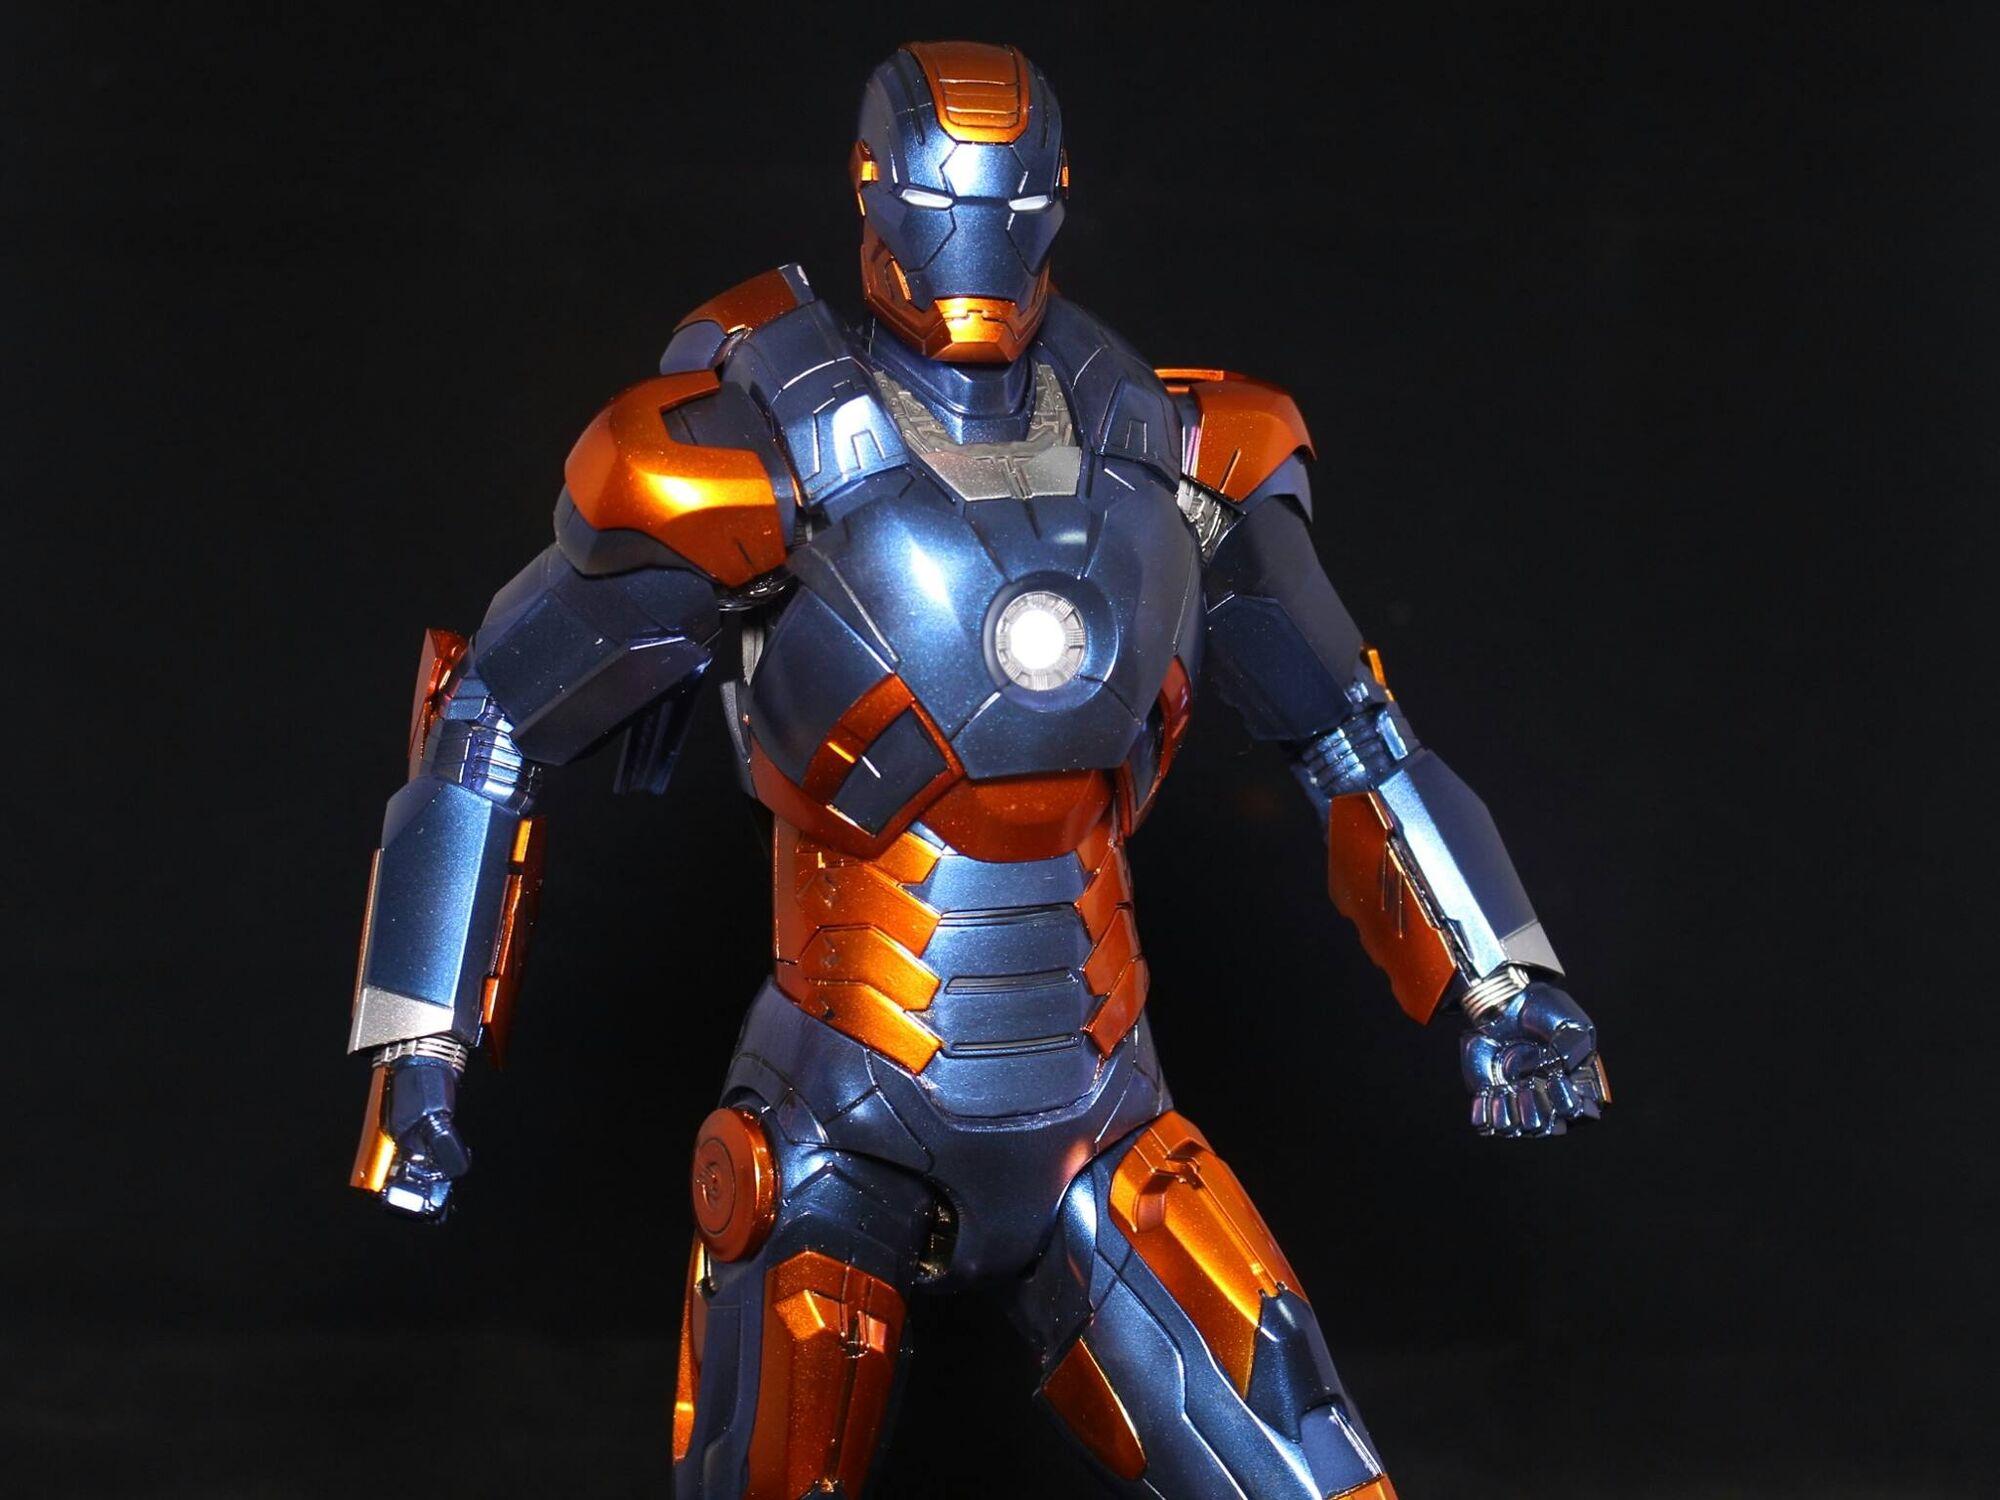 Image - 自創-Hottoys-Iron-Man-Mark-18-and-Mark-27-玩具點評4.jpg ...